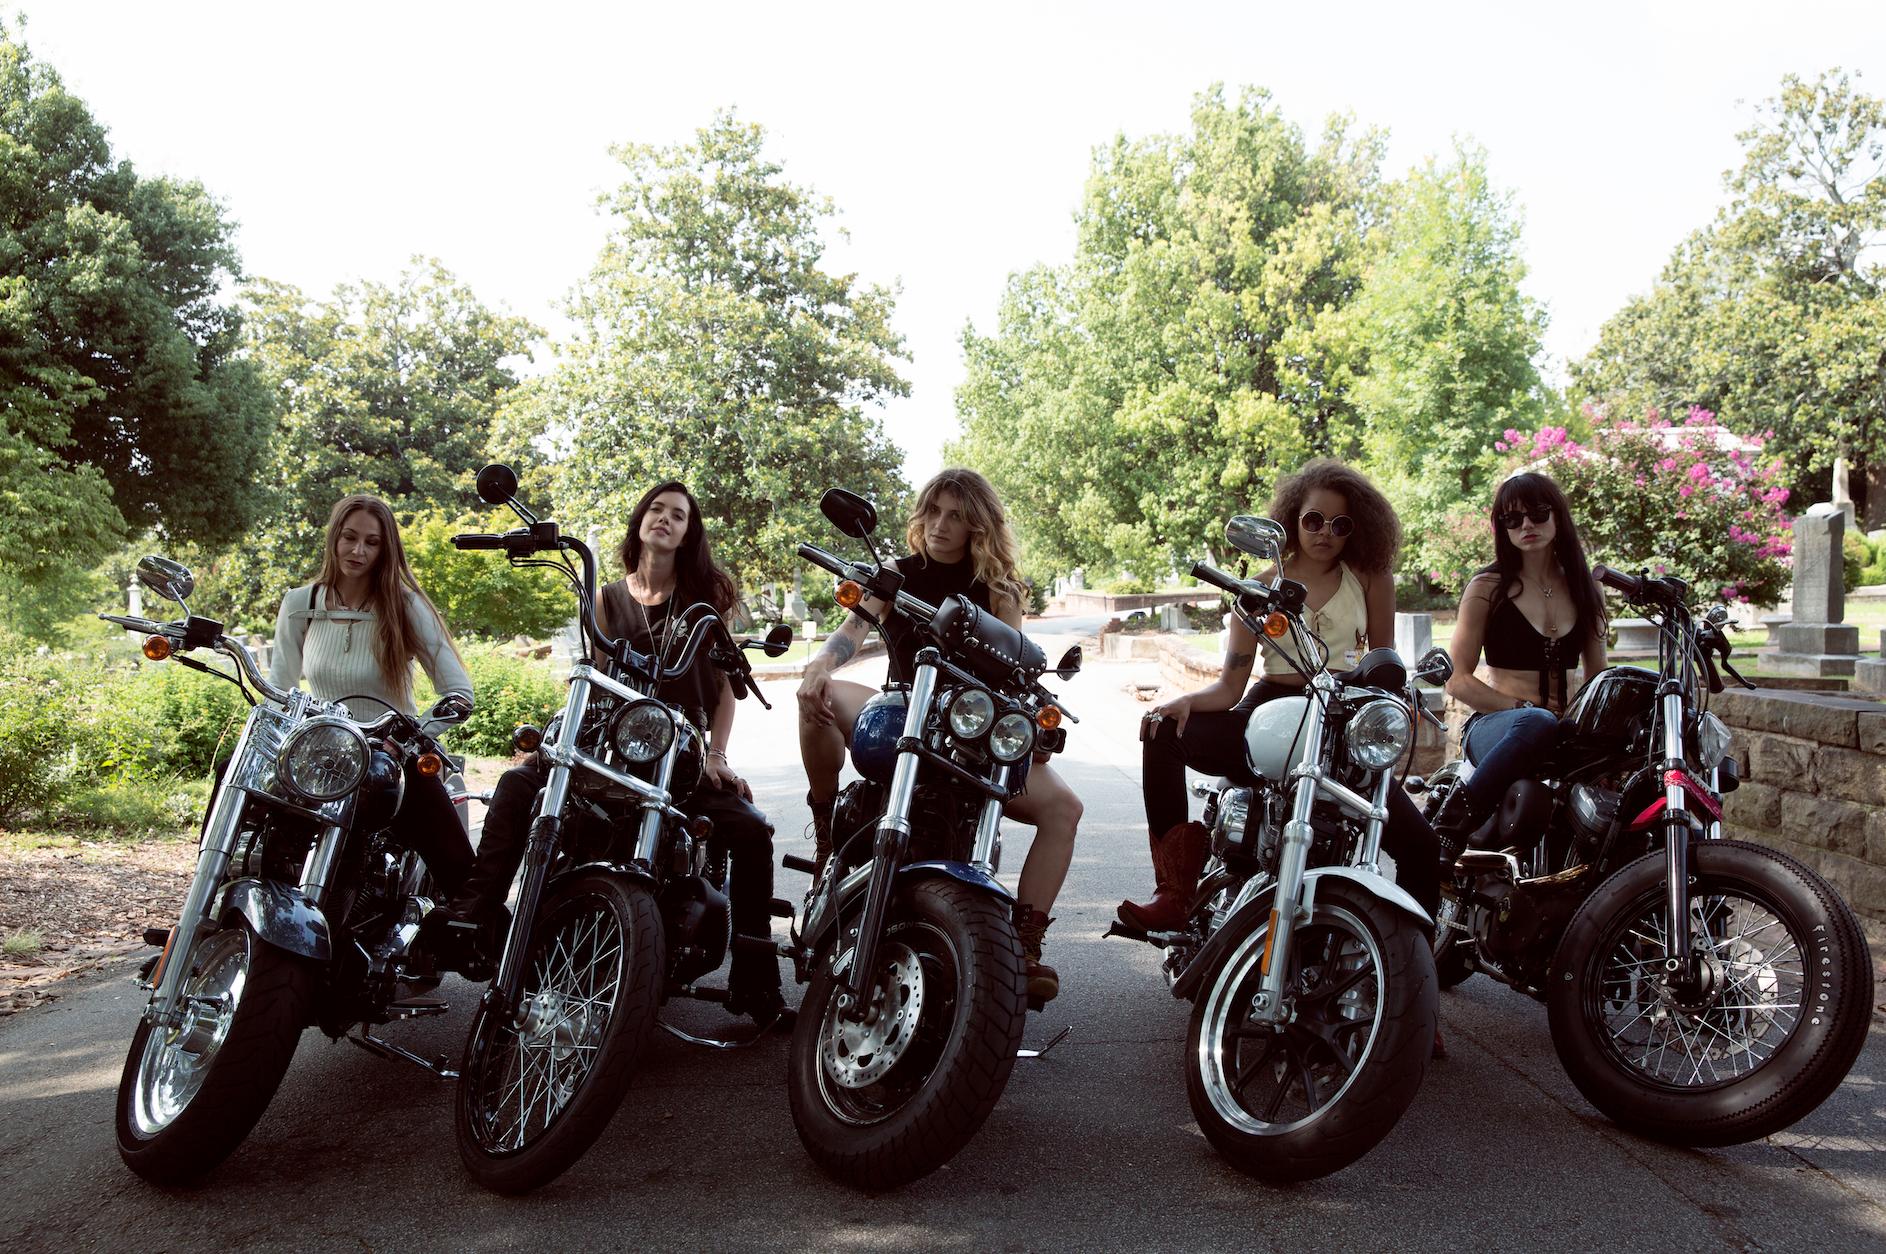 badass bikes biker lady motorcycle bike bikers harley motorcycles chick chicks elle daryl dixon highway walking dead buell